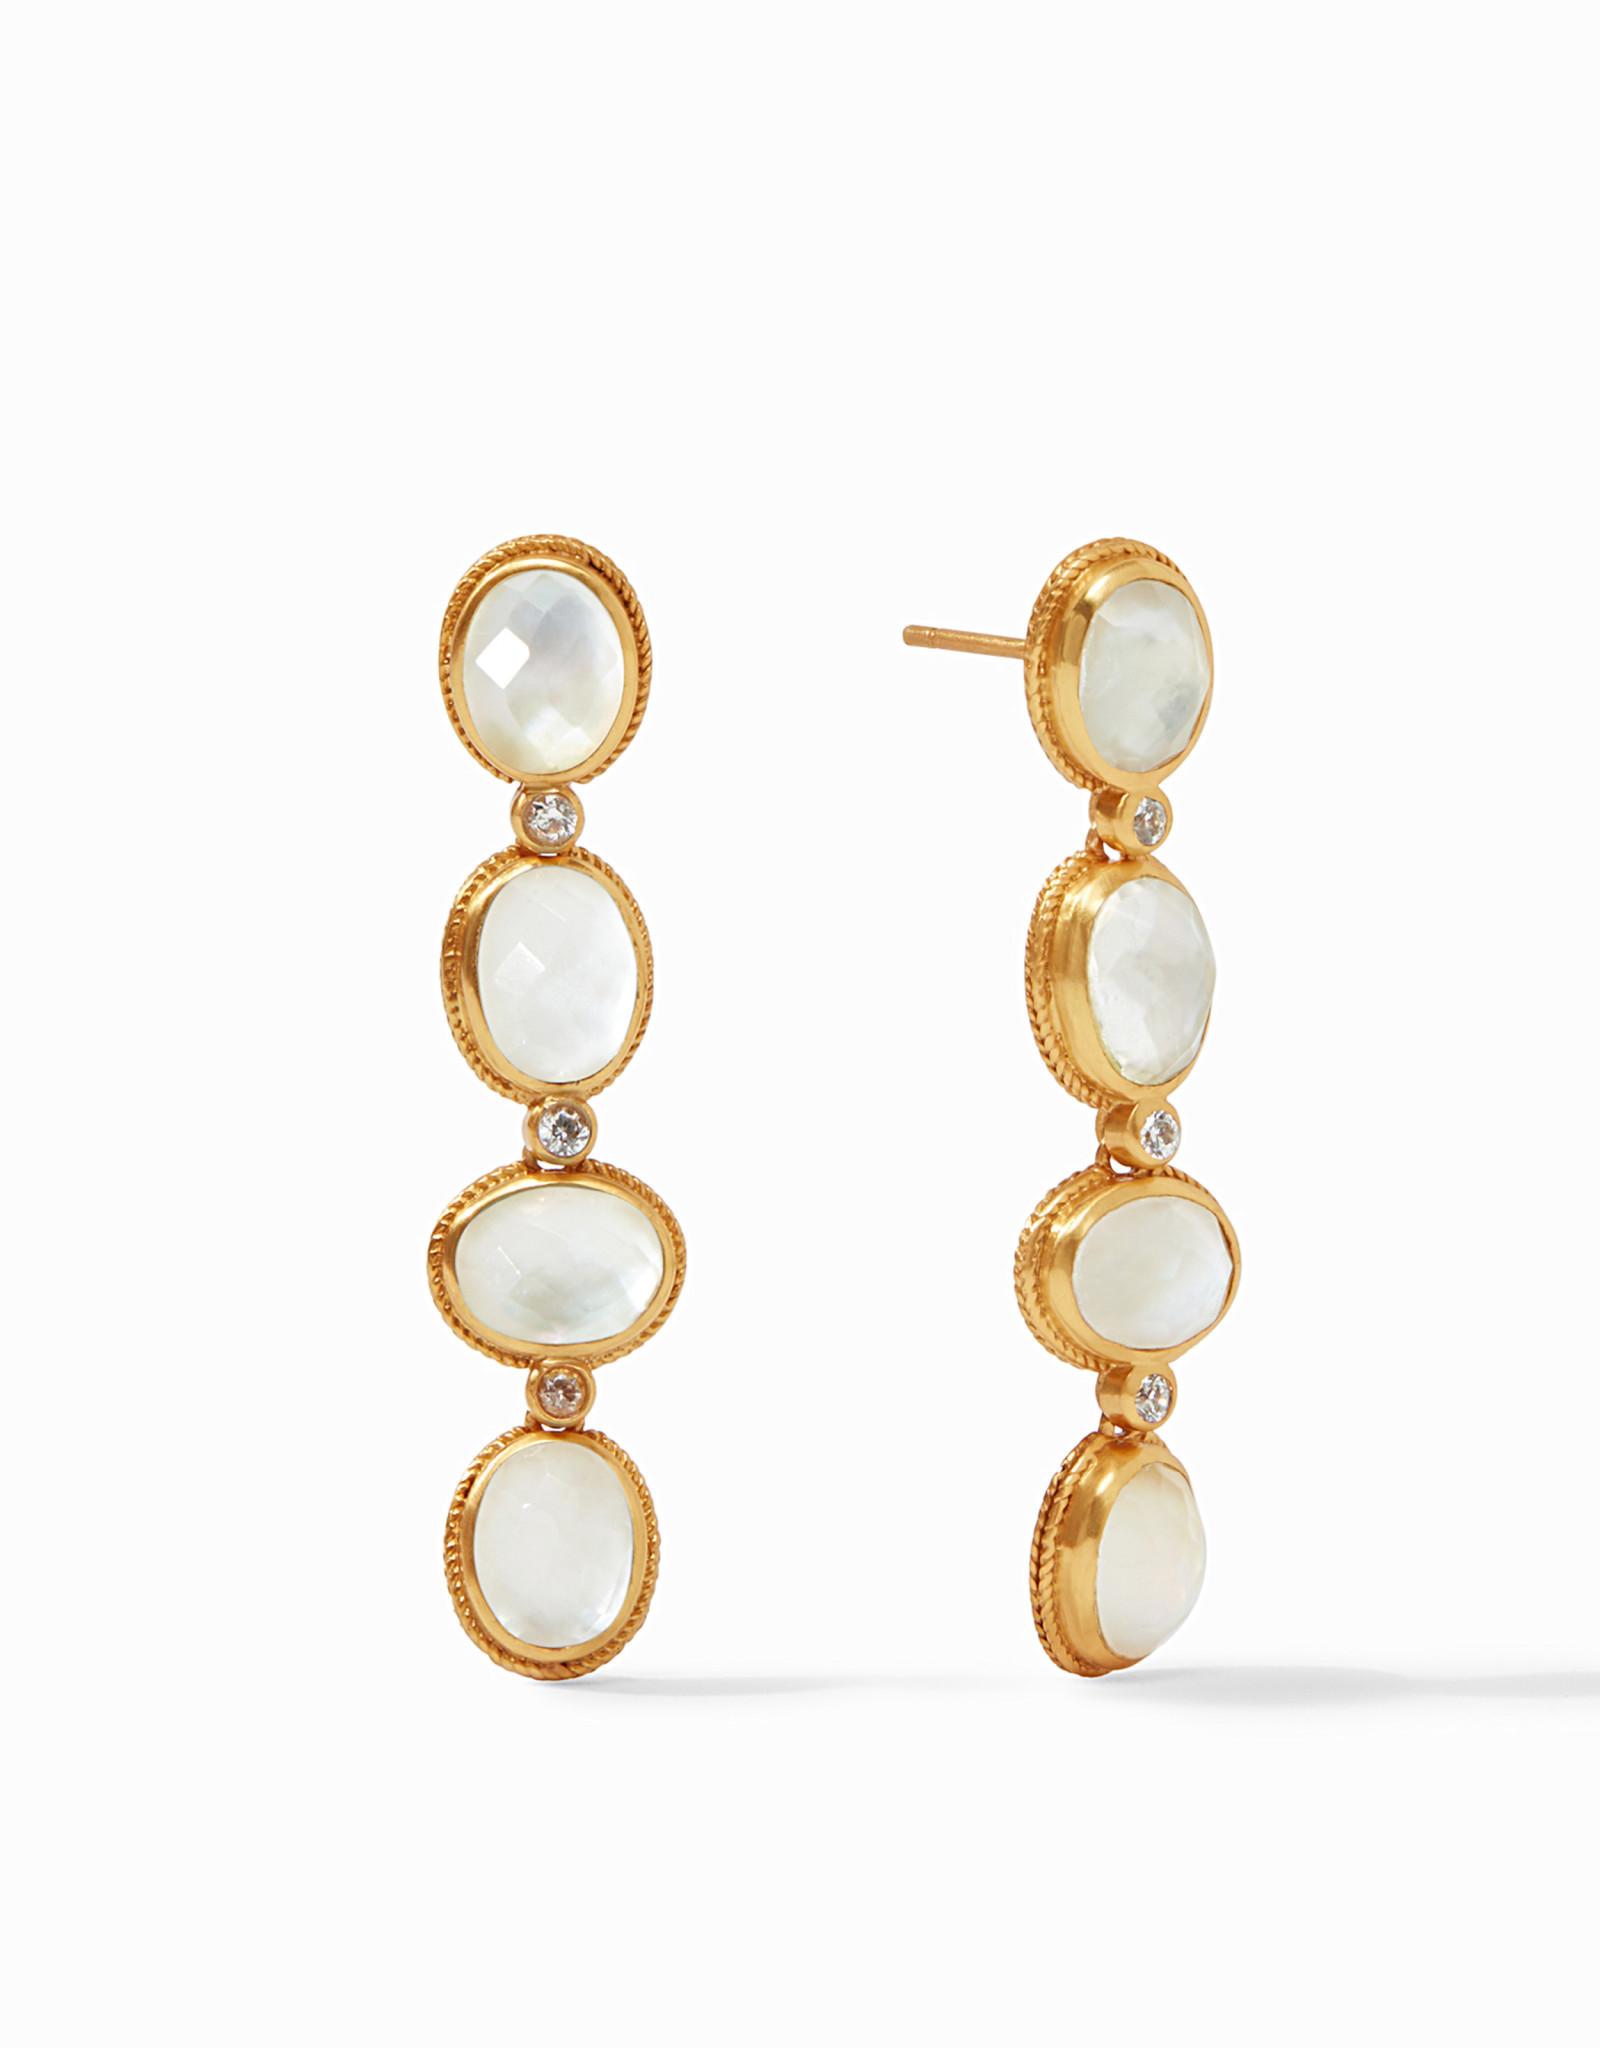 Julie Vos Calypso Statement Earring Gold Iridescent